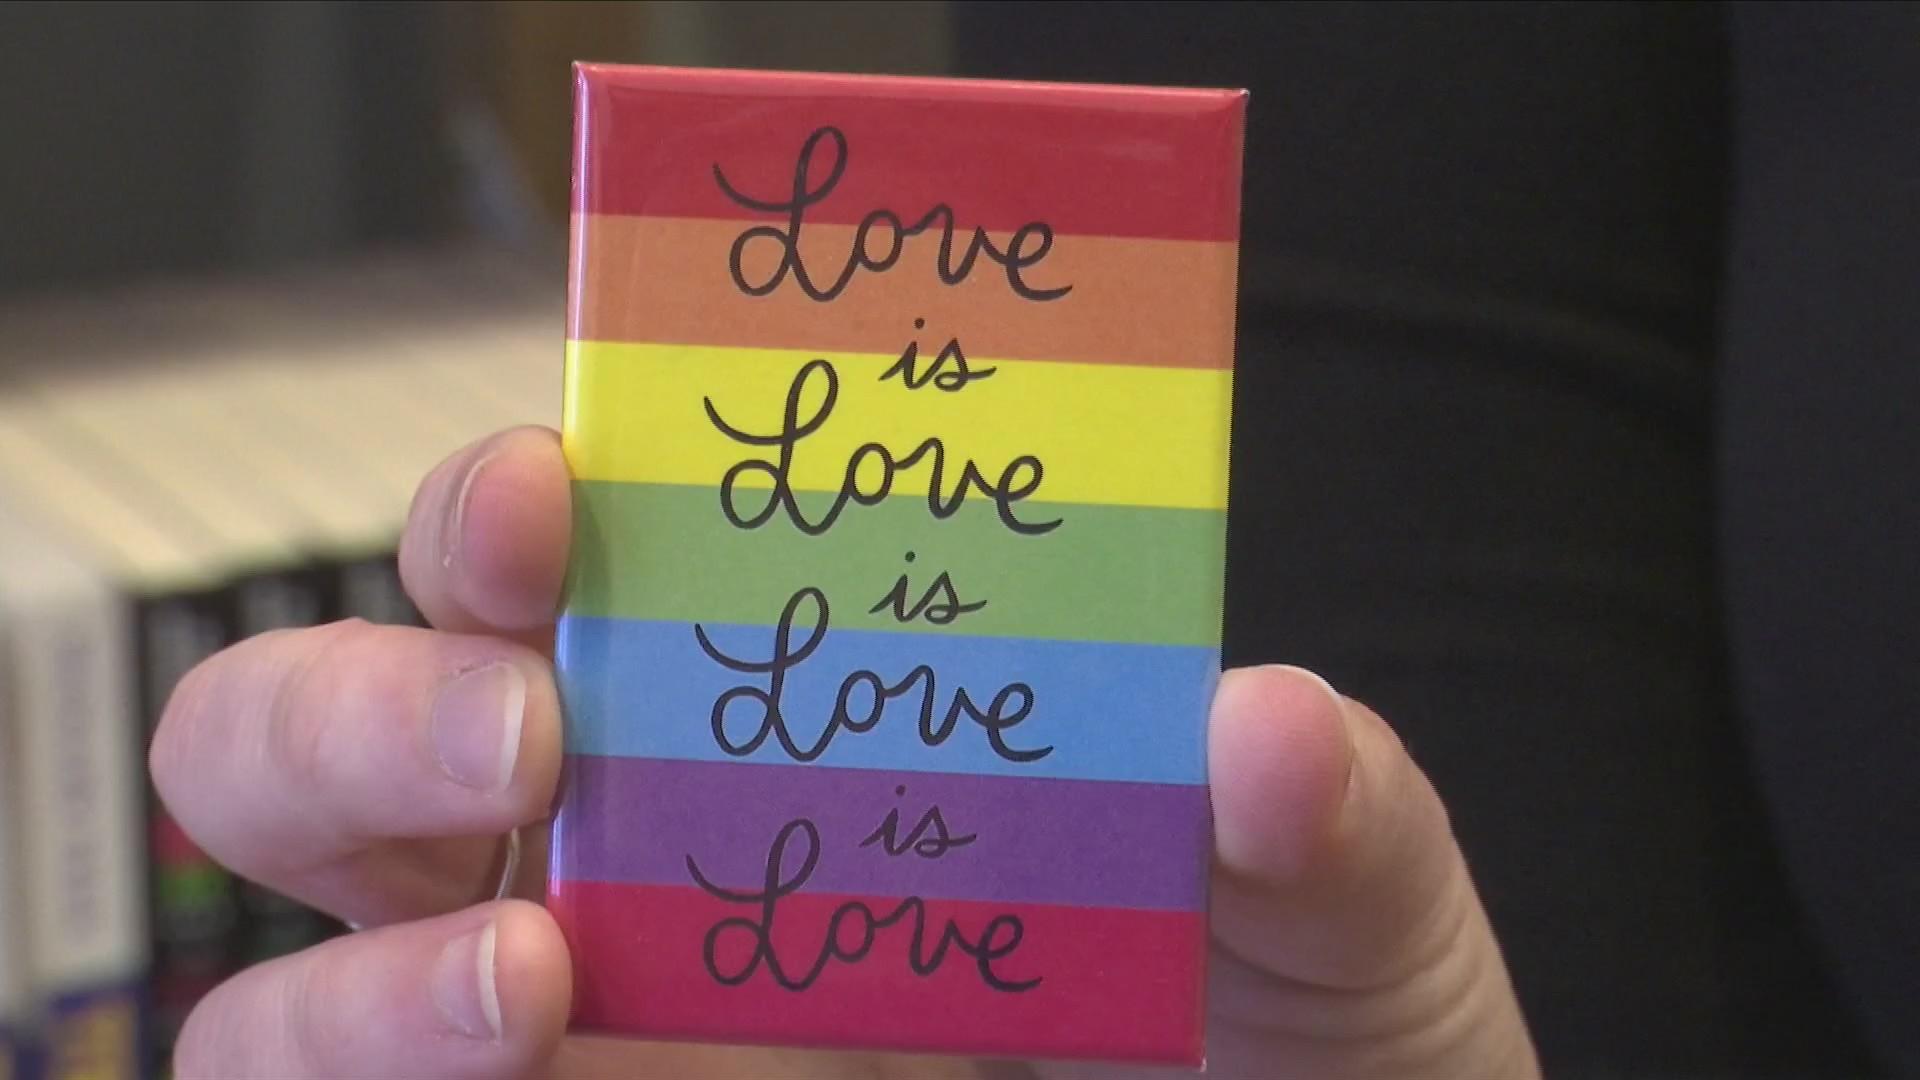 Inaugural_Corning_Pride_event_June_15_0_20190321211817